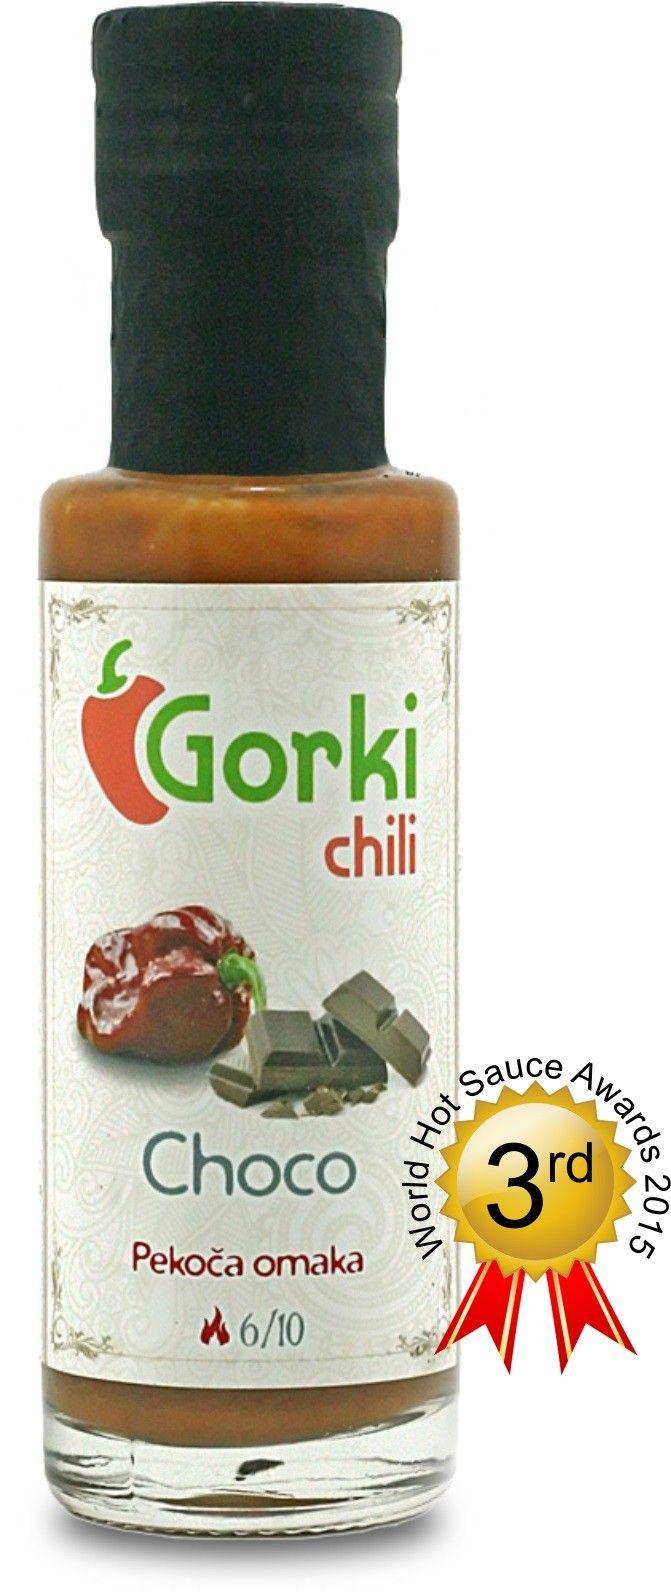 GORKI CHILI - SALSA PICCANTE CHOCO GR. 100